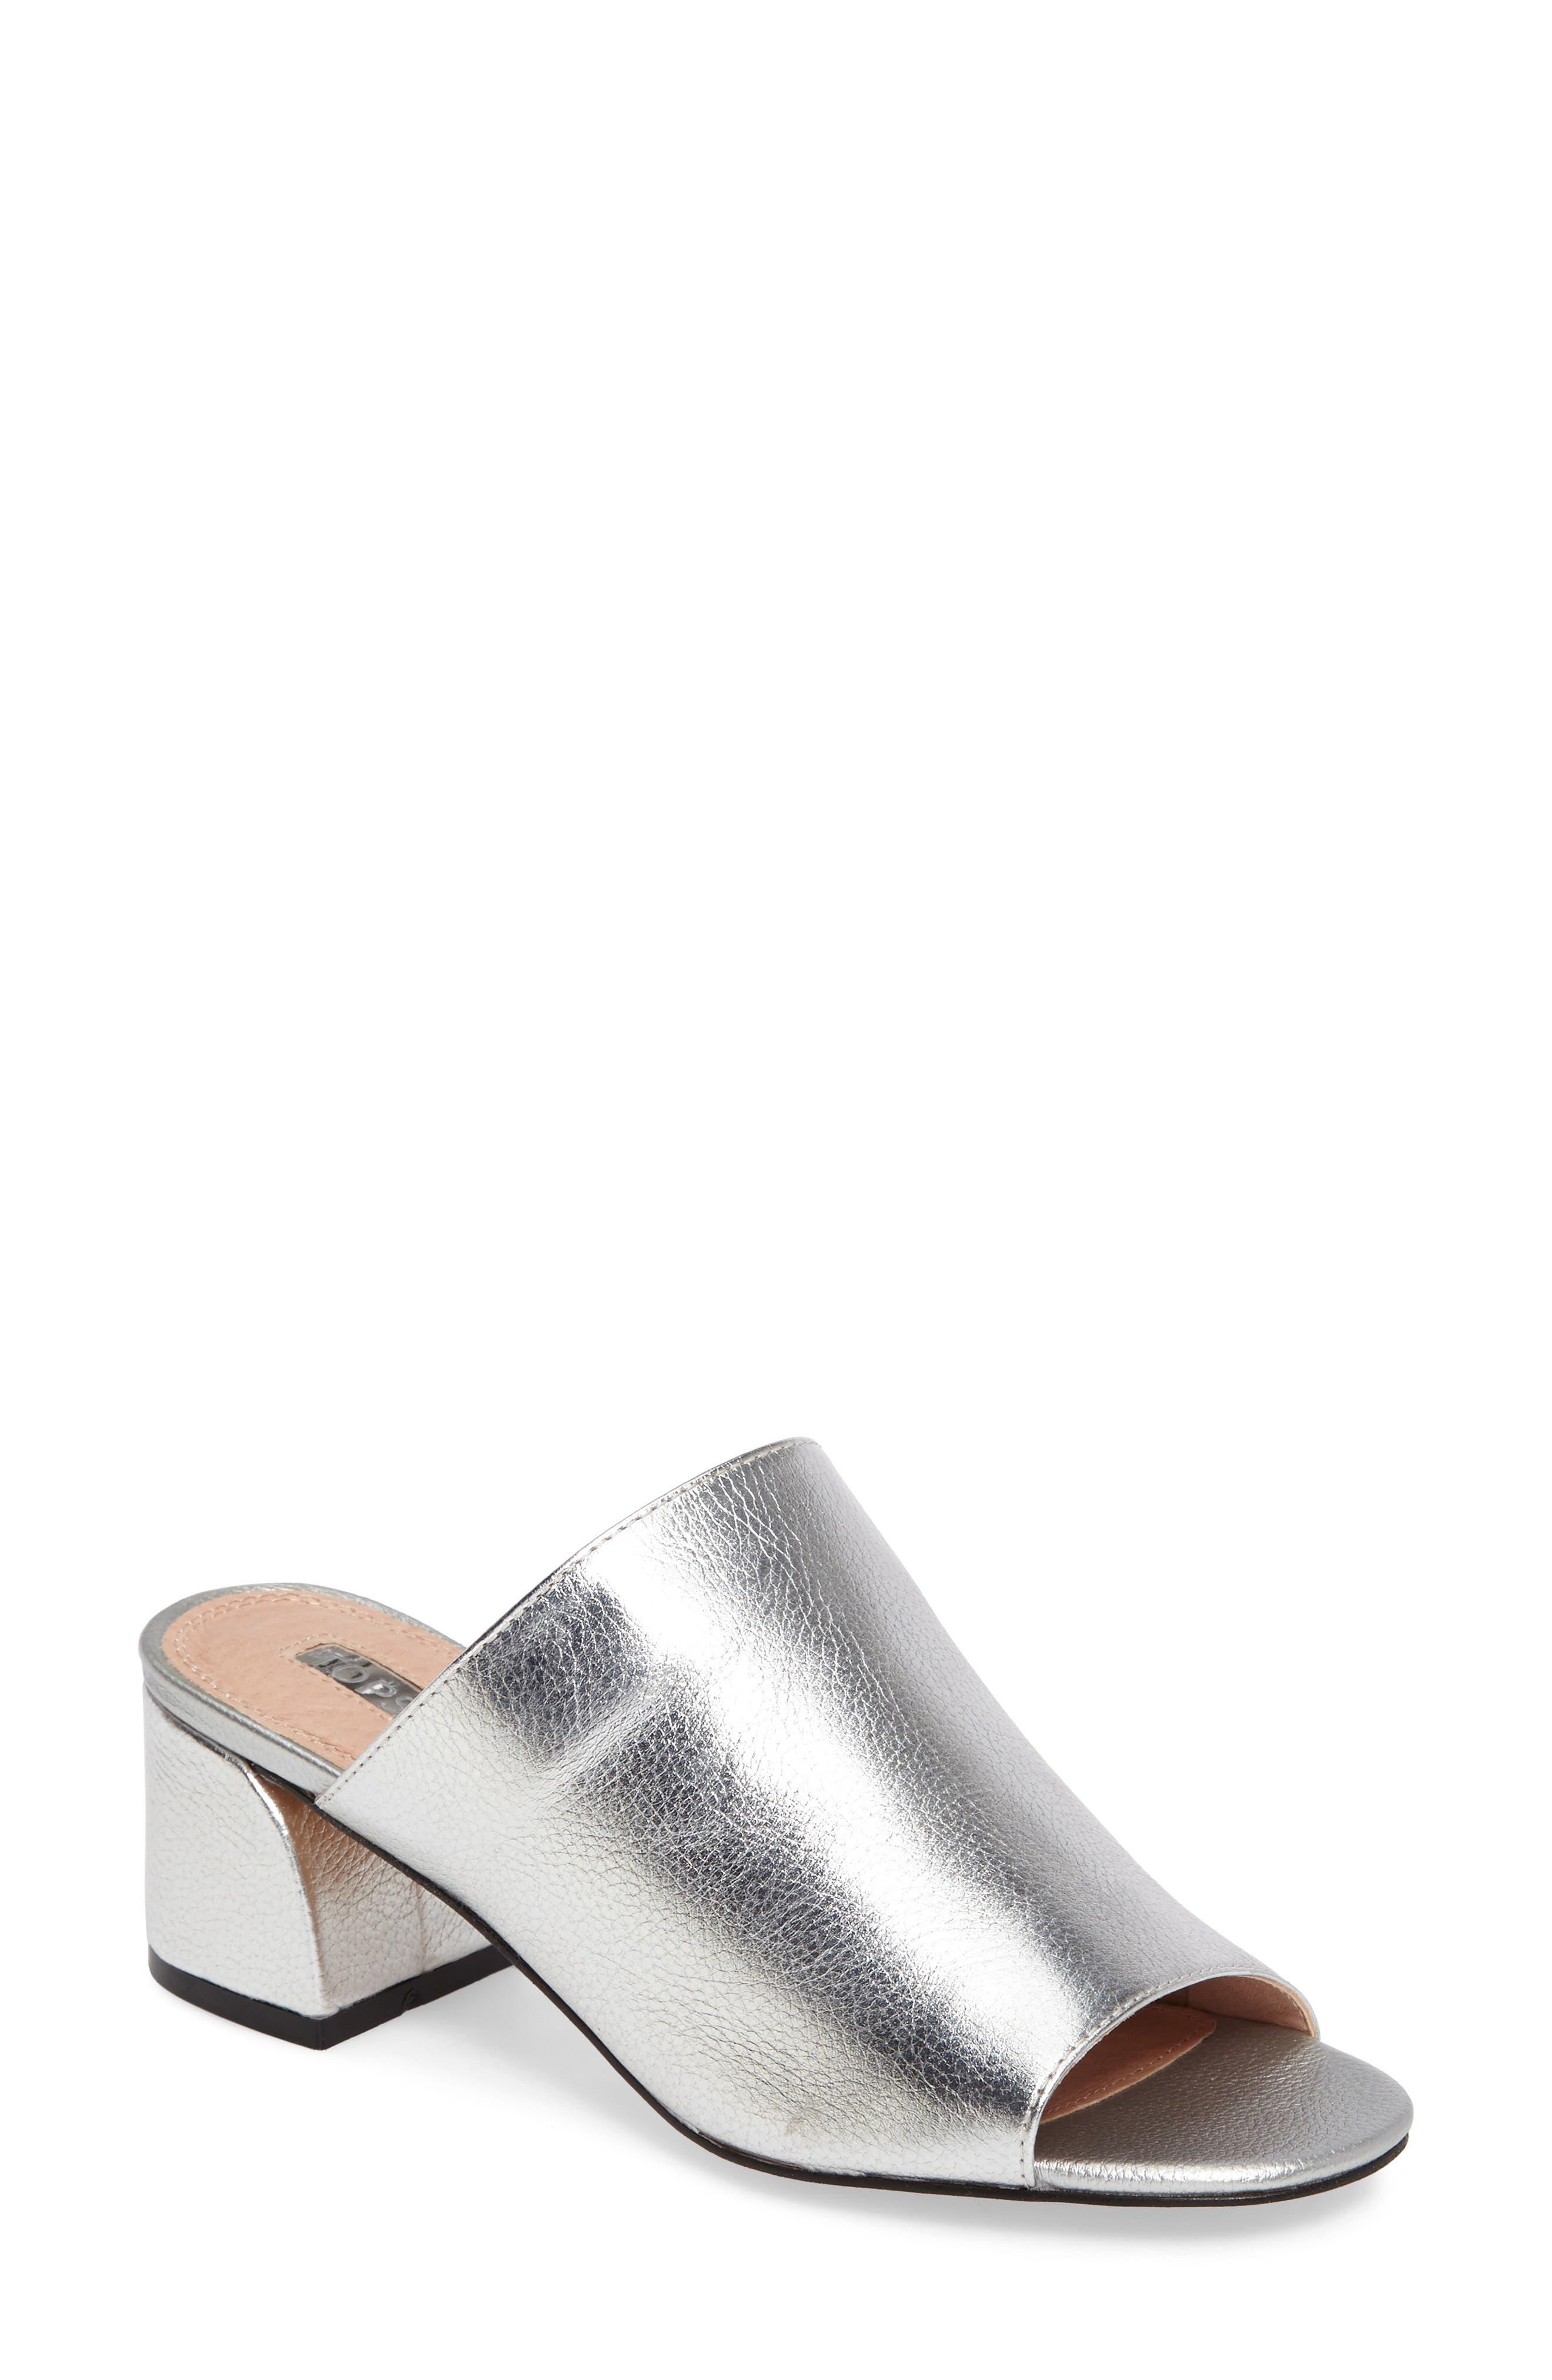 Notorious Metallic Slide Sandal,                             Main thumbnail 1, color,                             040